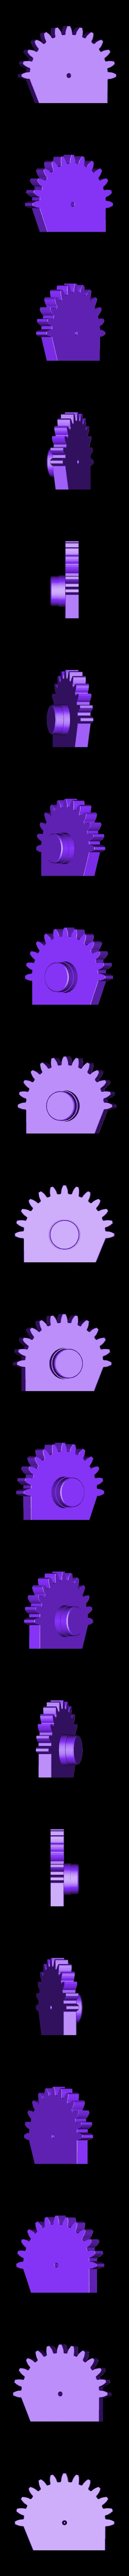 gear_leg_R.stl Download free STL file RoboDog v1.0 • 3D printing object, robolab19